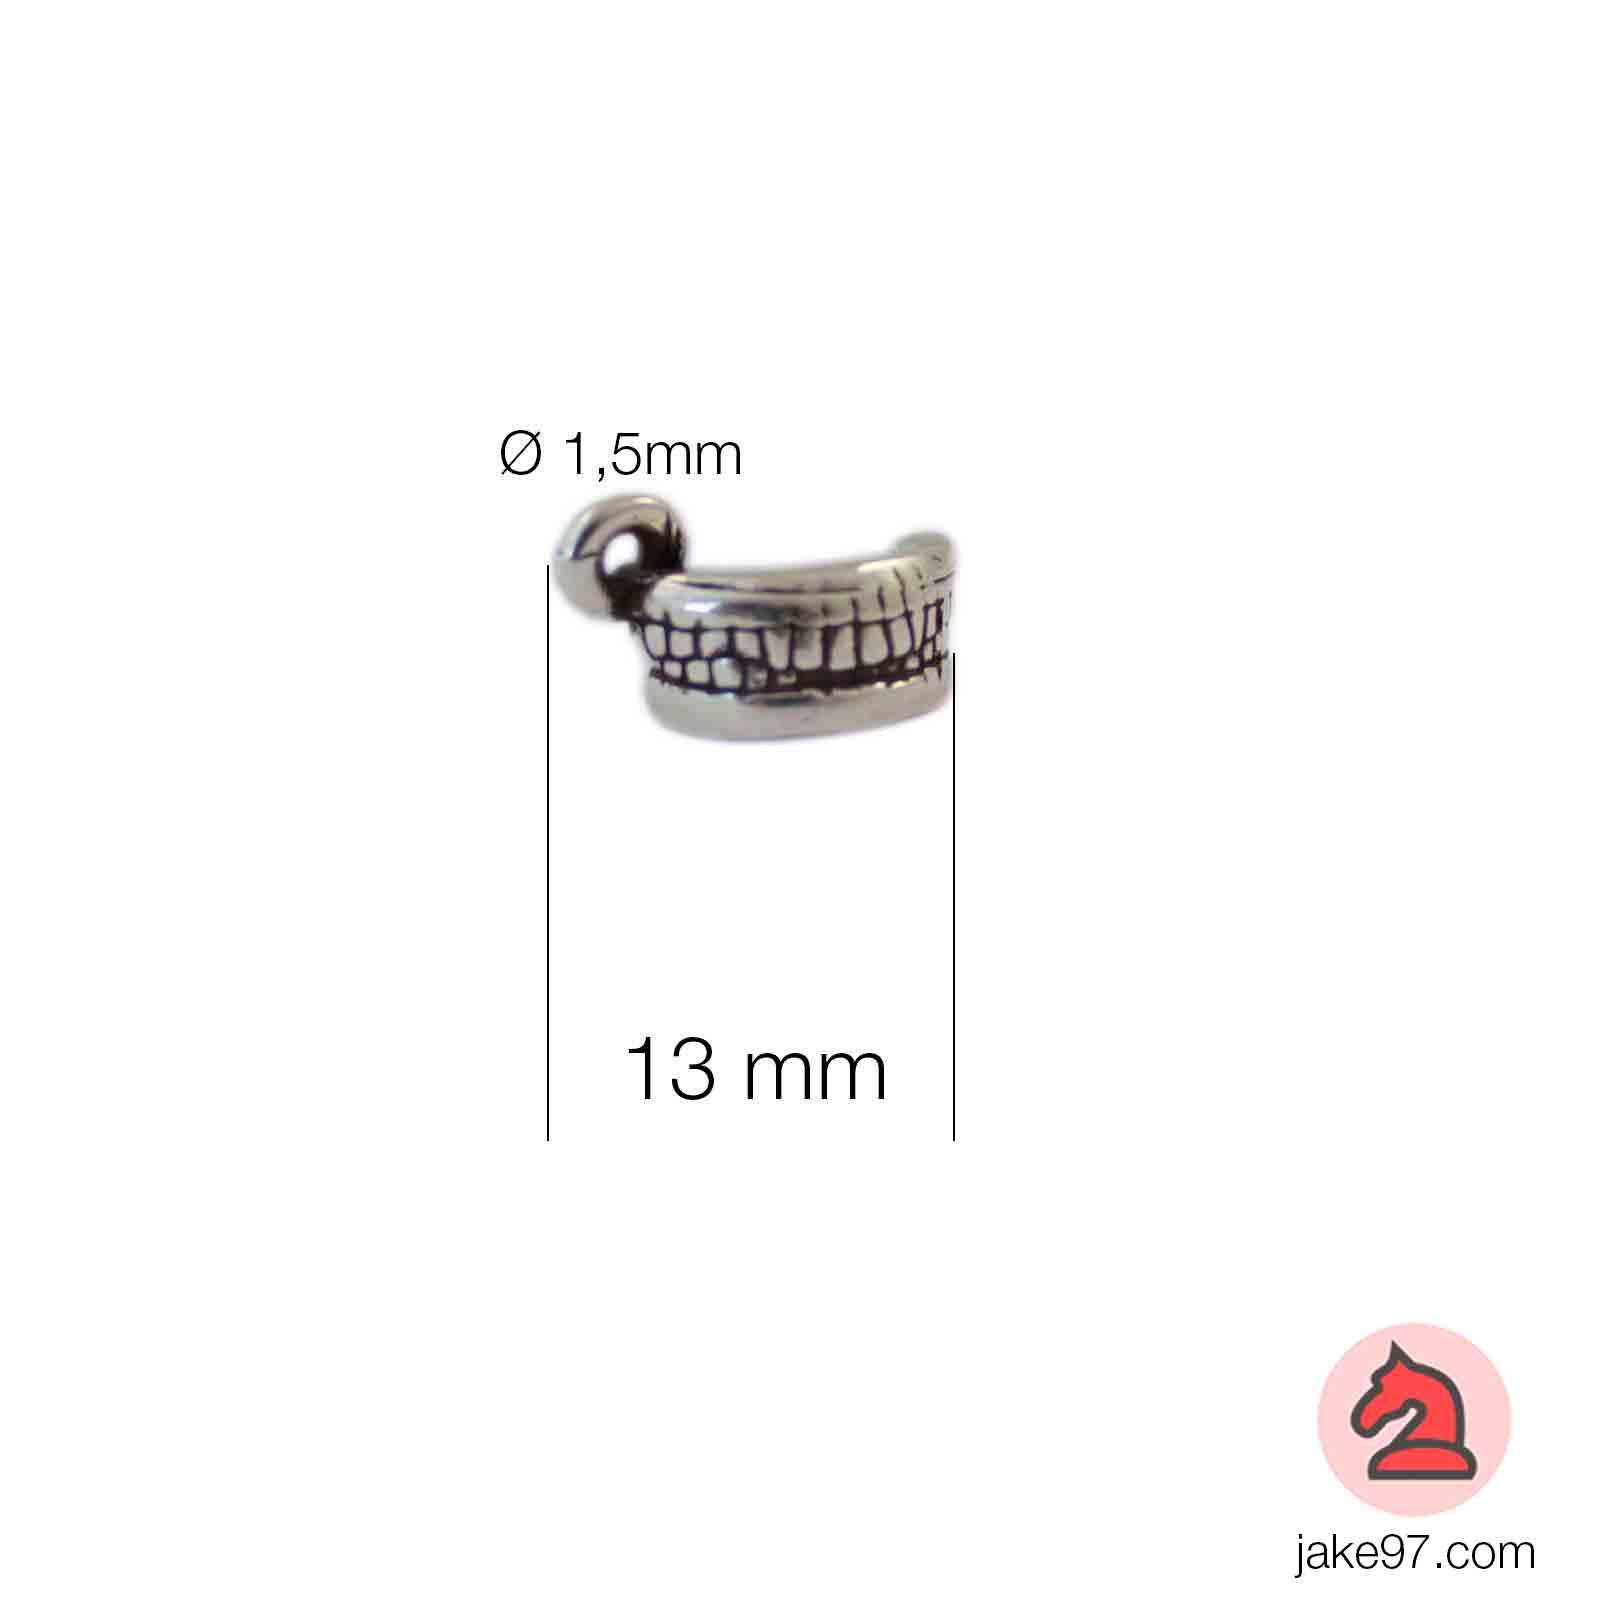 Charm dentadura - Venta en bolsa de 30 unidadesTamaño aproximado 13mm, anilla 1.5mm